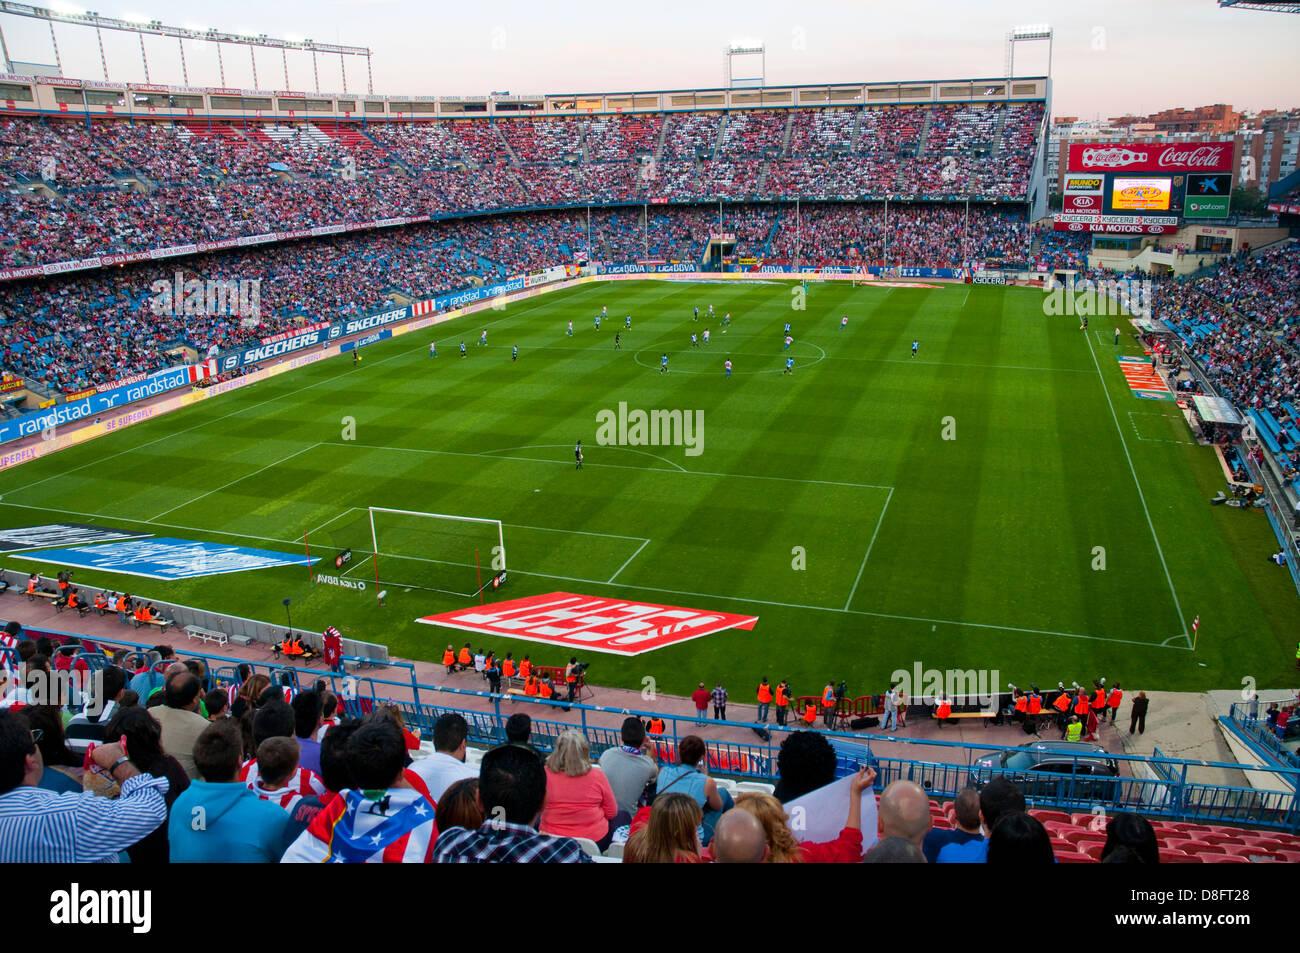 Football match in Vicente Calderon stadium. Madrid. - Stock Image